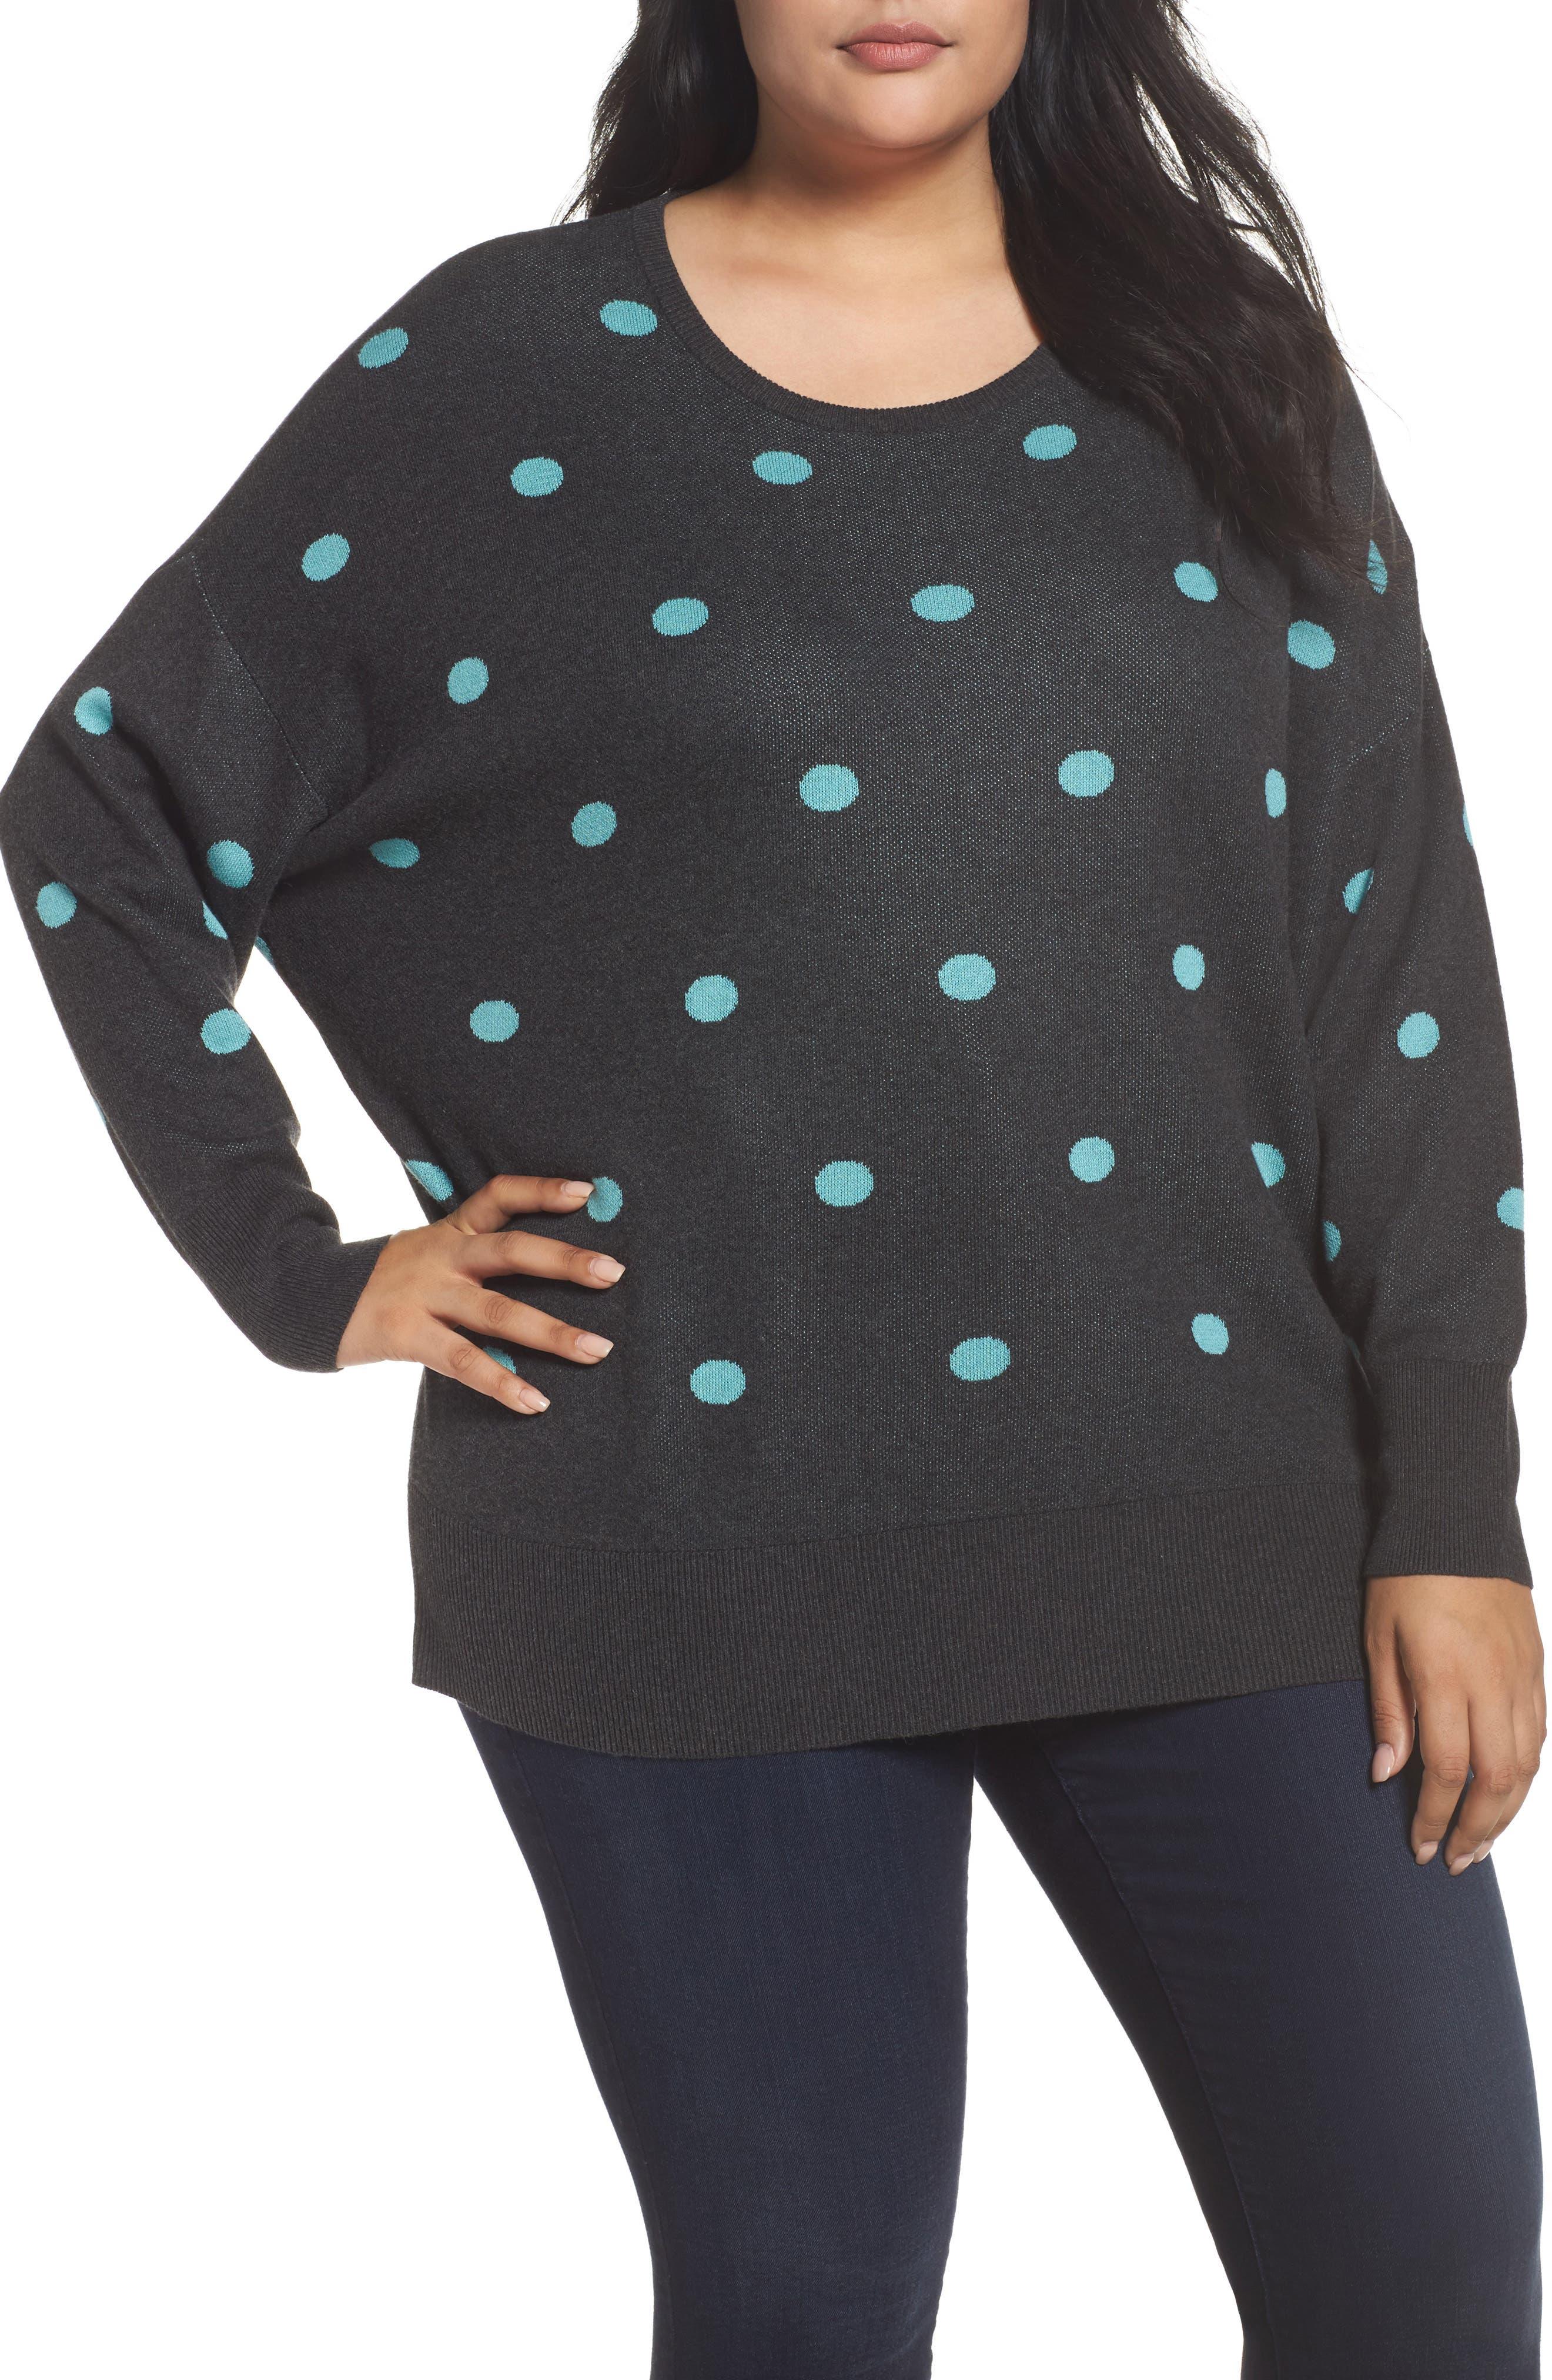 Dolman Sleeve Crewneck Sweater,                         Main,                         color, Grey- Blue Dots Pattern